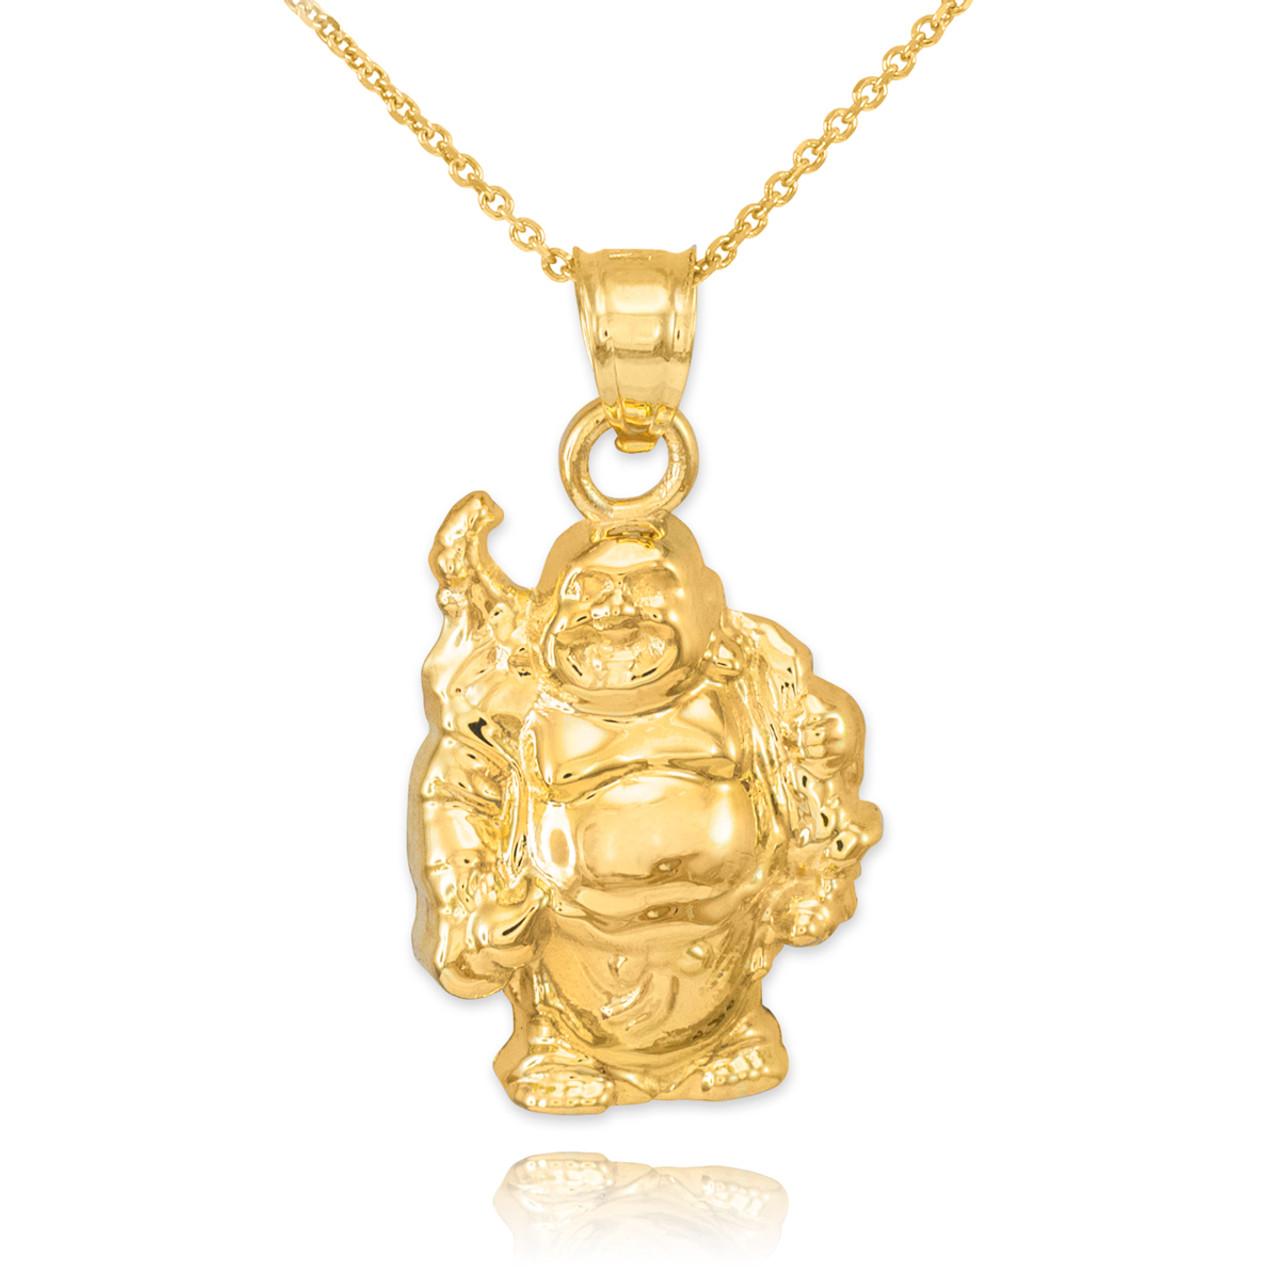 Gold laughing buddha pendant necklace buddha buddhist pendant gold laughing buddha pendant necklace aloadofball Image collections